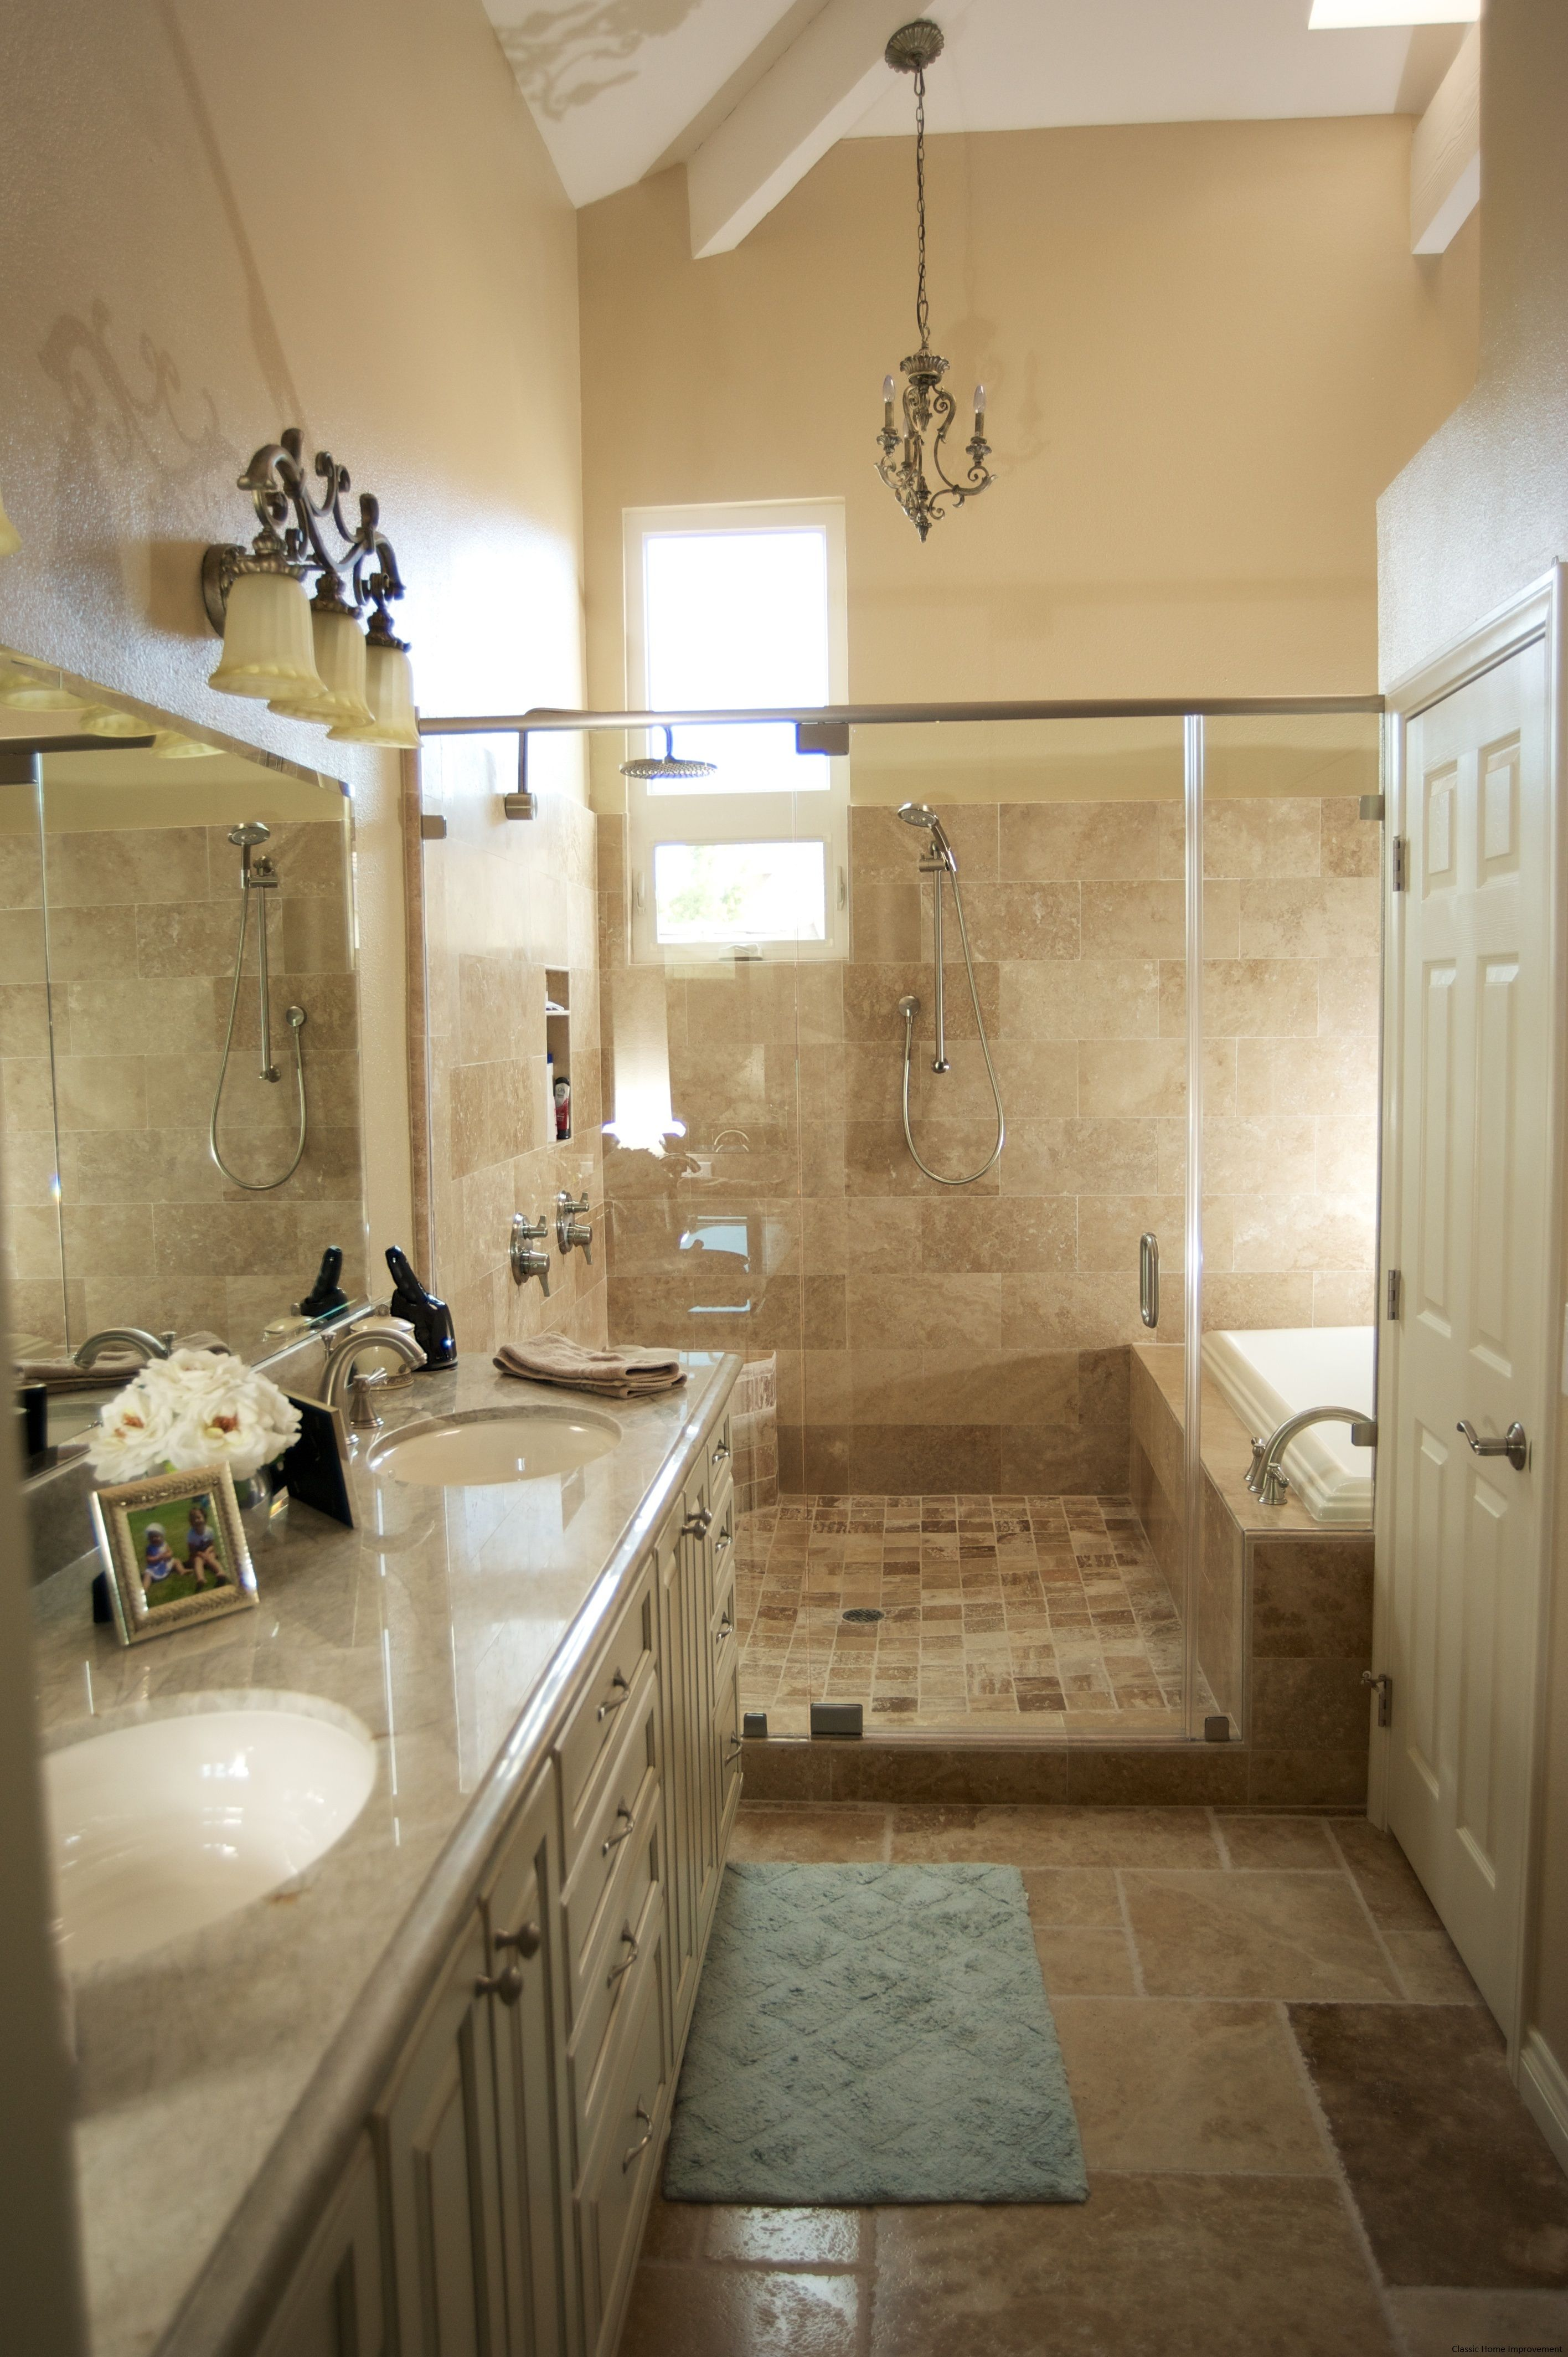 A Great Bathroom For Couples Nice Neutral Colors And A Glass Custom Great Bathroom Ideas 2018